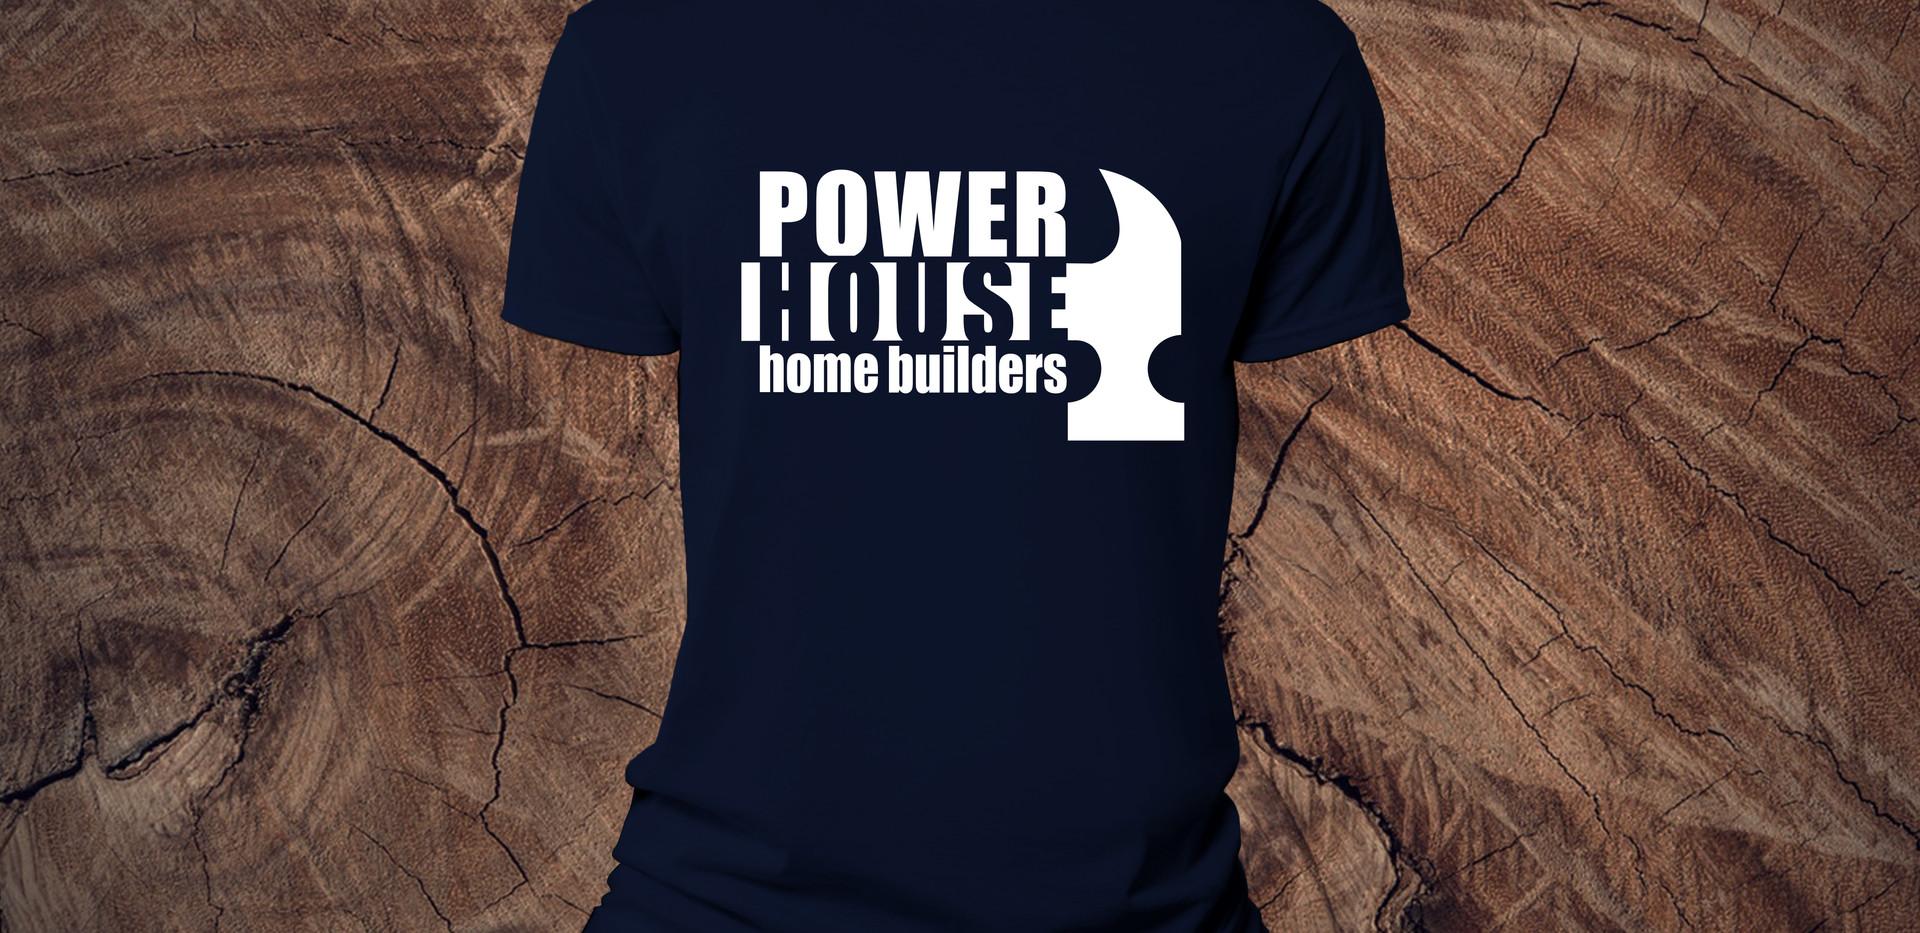 Powerhouse Home Builders Tshirt